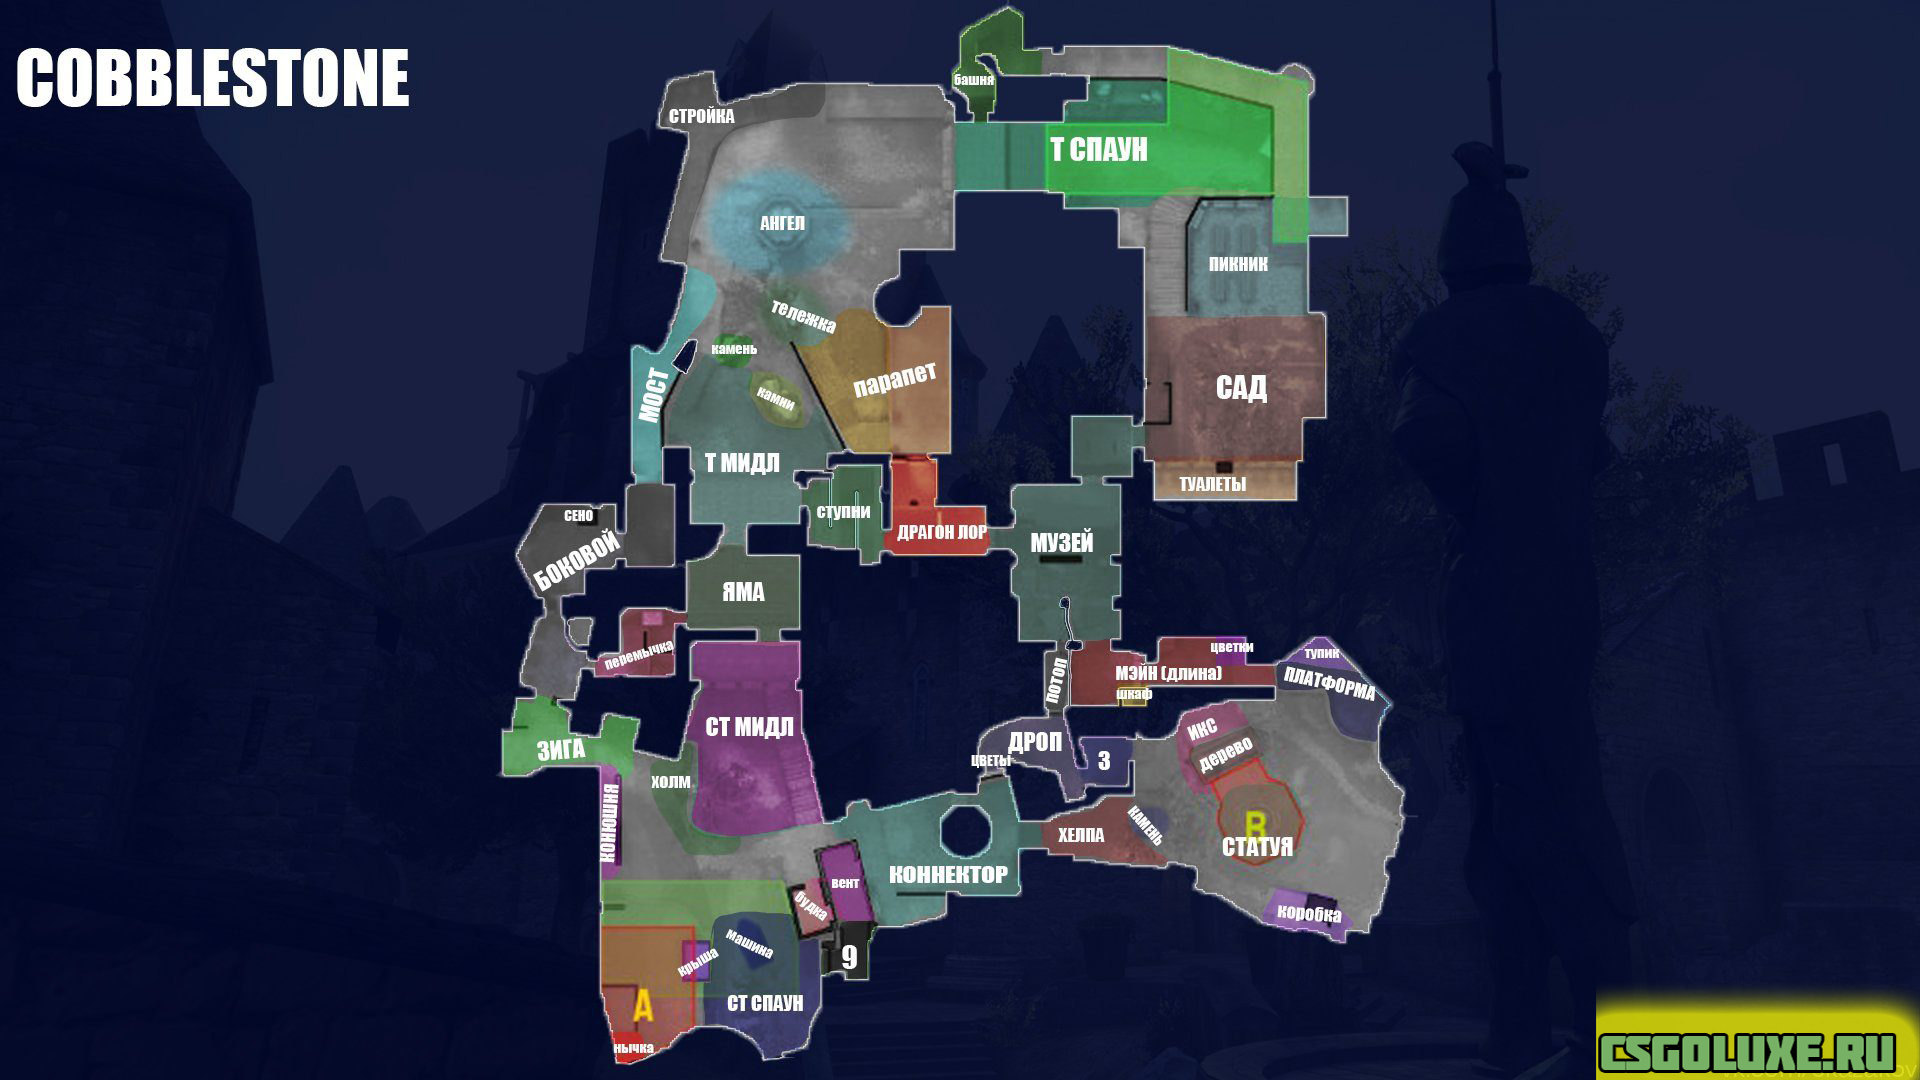 Обозначение точек на карте Cobblestone